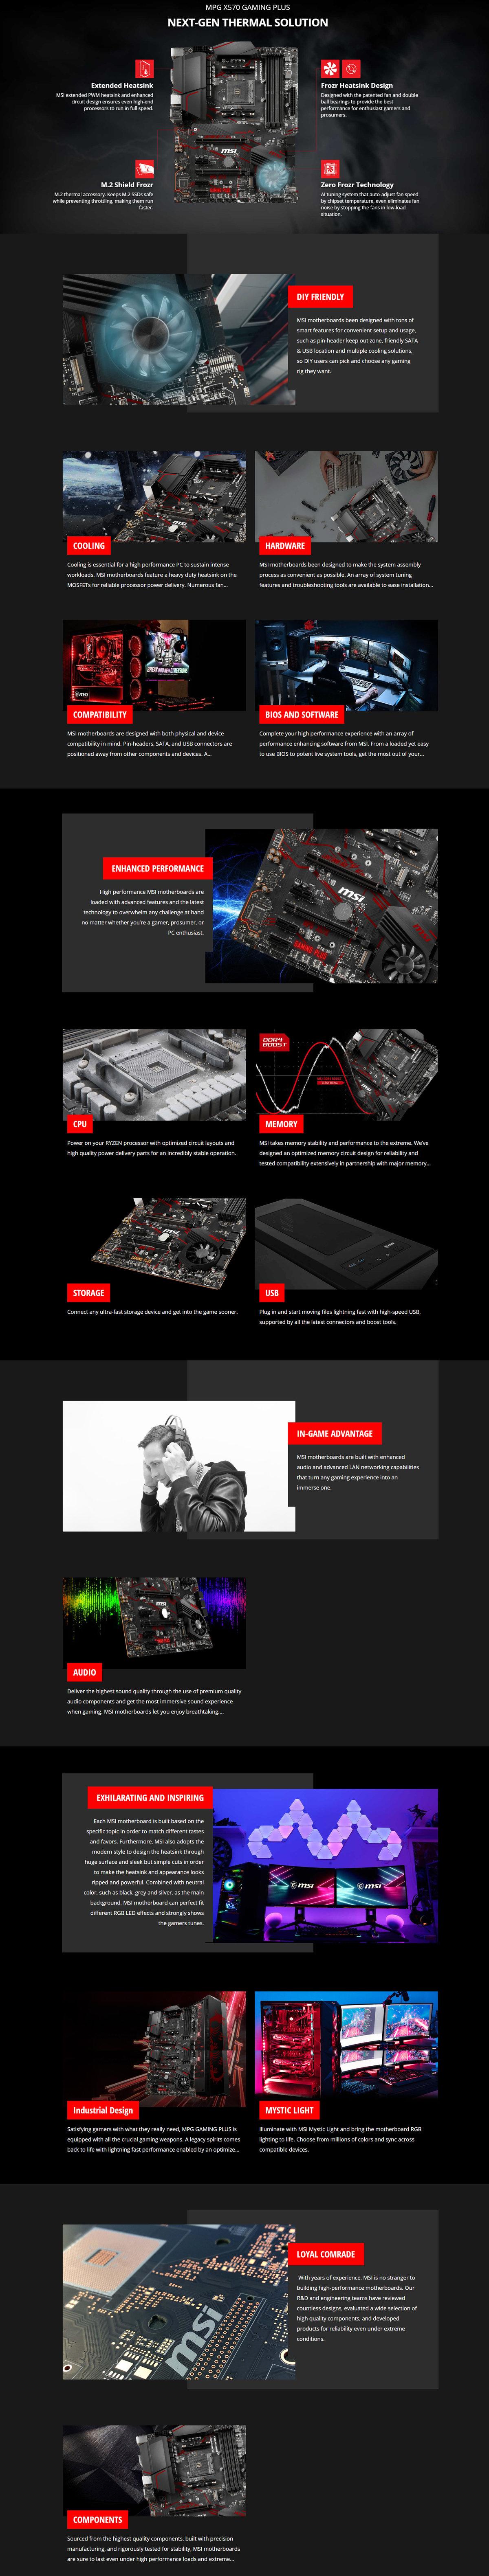 Details about MSI MPG X570 GAMING PLUS AMD Socket AM4 ATX Motherboard DDR4  HDMI M 2 USB3 2 RGB